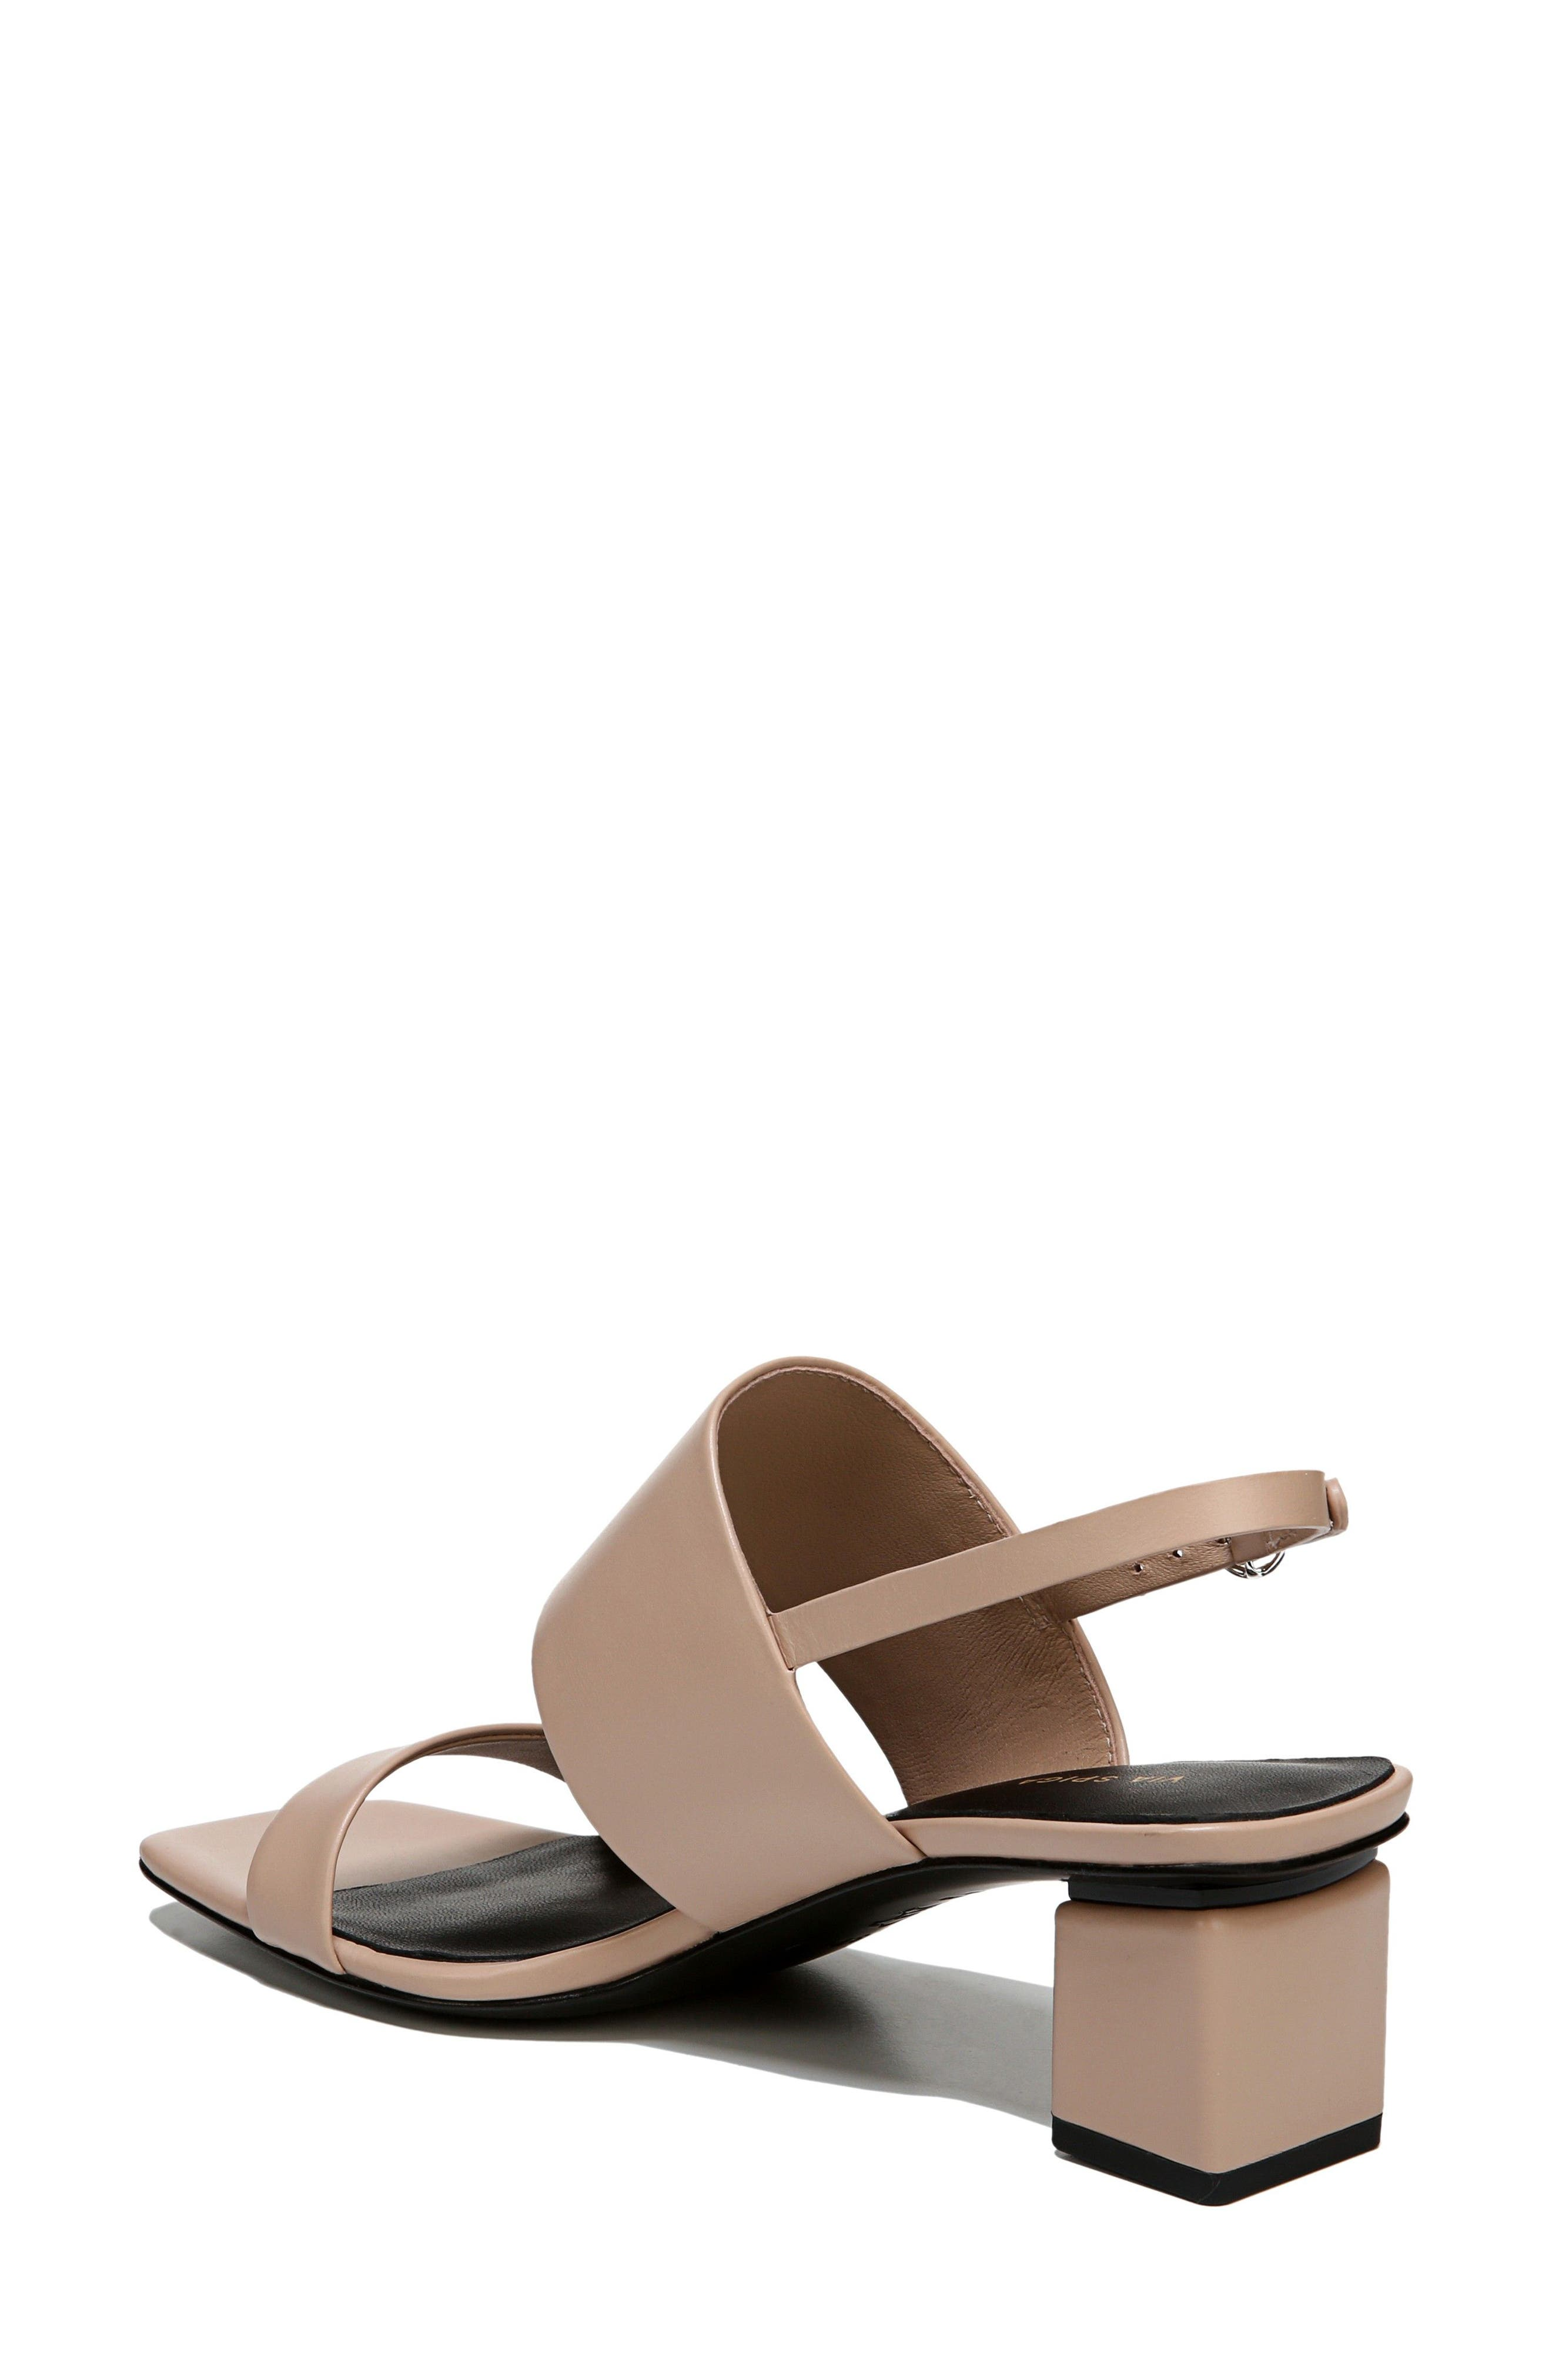 Forte Block Heel Sandal,                             Alternate thumbnail 2, color,                             Sand Patent